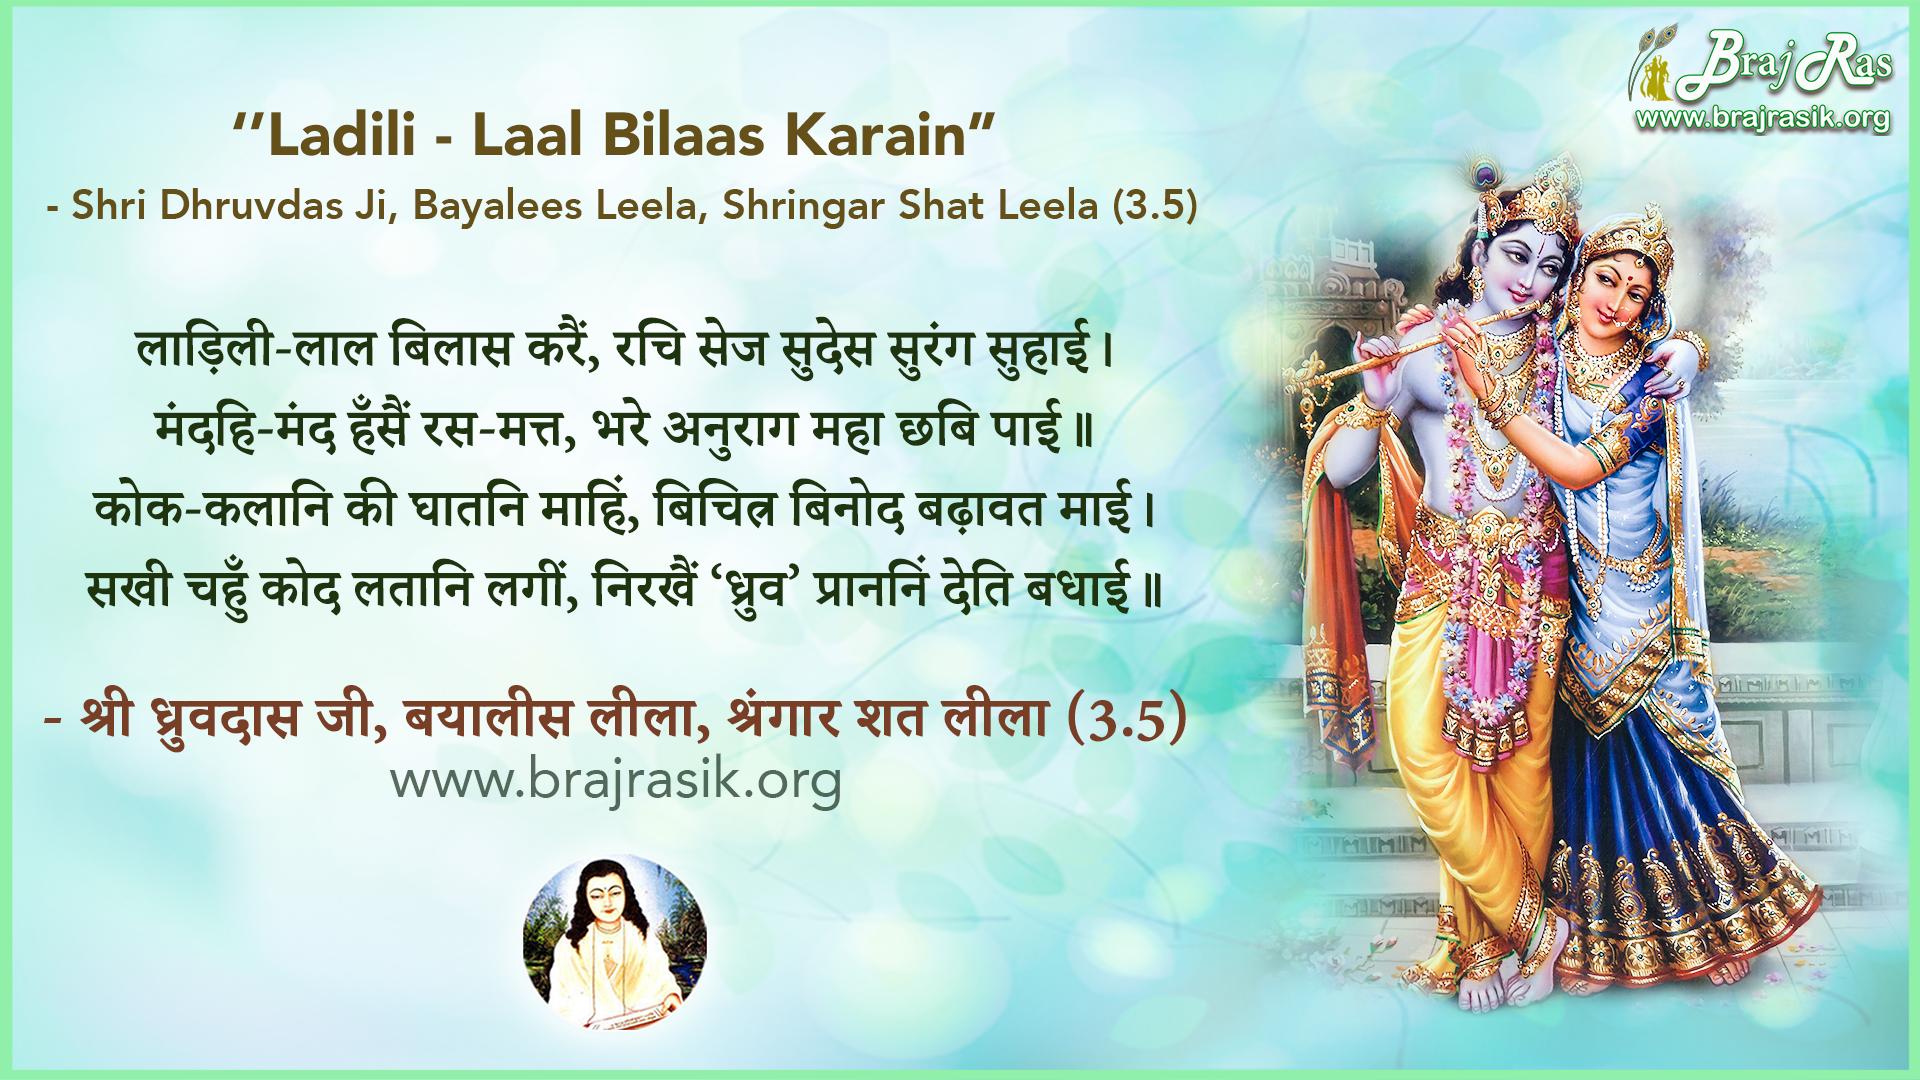 Ladili-Laal Bilaas Karai, Rachi - Shri Dhruvdas Ji, Bayalees Leela, Shringar Shat Leela (3.5)